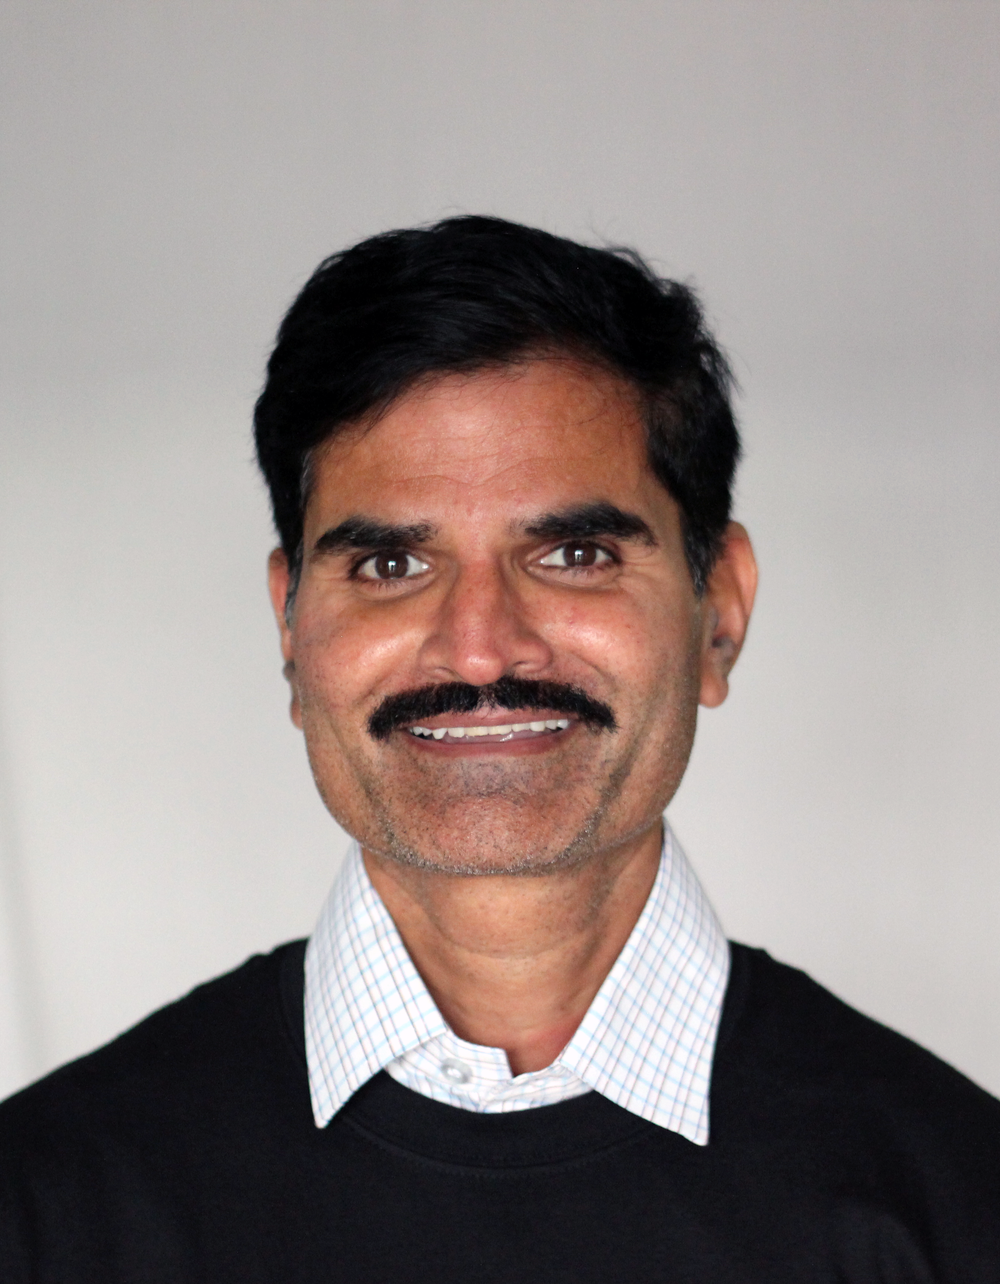 Ravindra Revanur, Ph.D. - Director of Membrane R&D